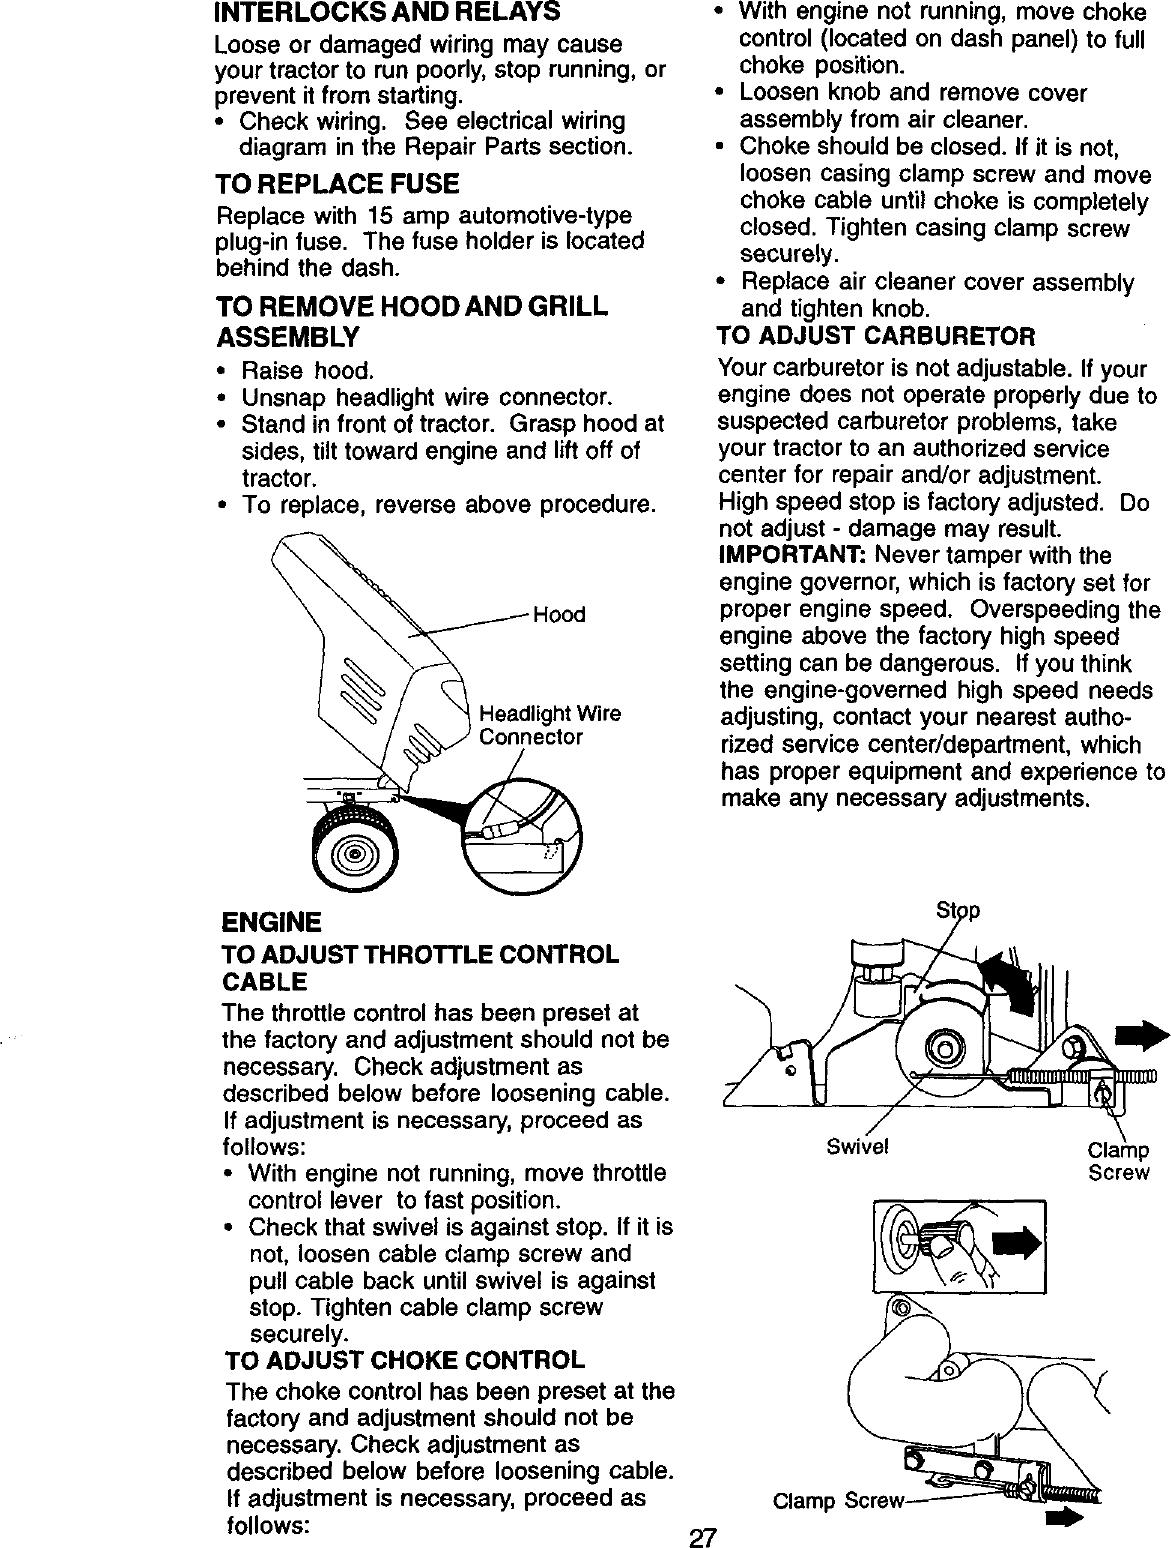 Craftsman 917 27076 Users Manual on